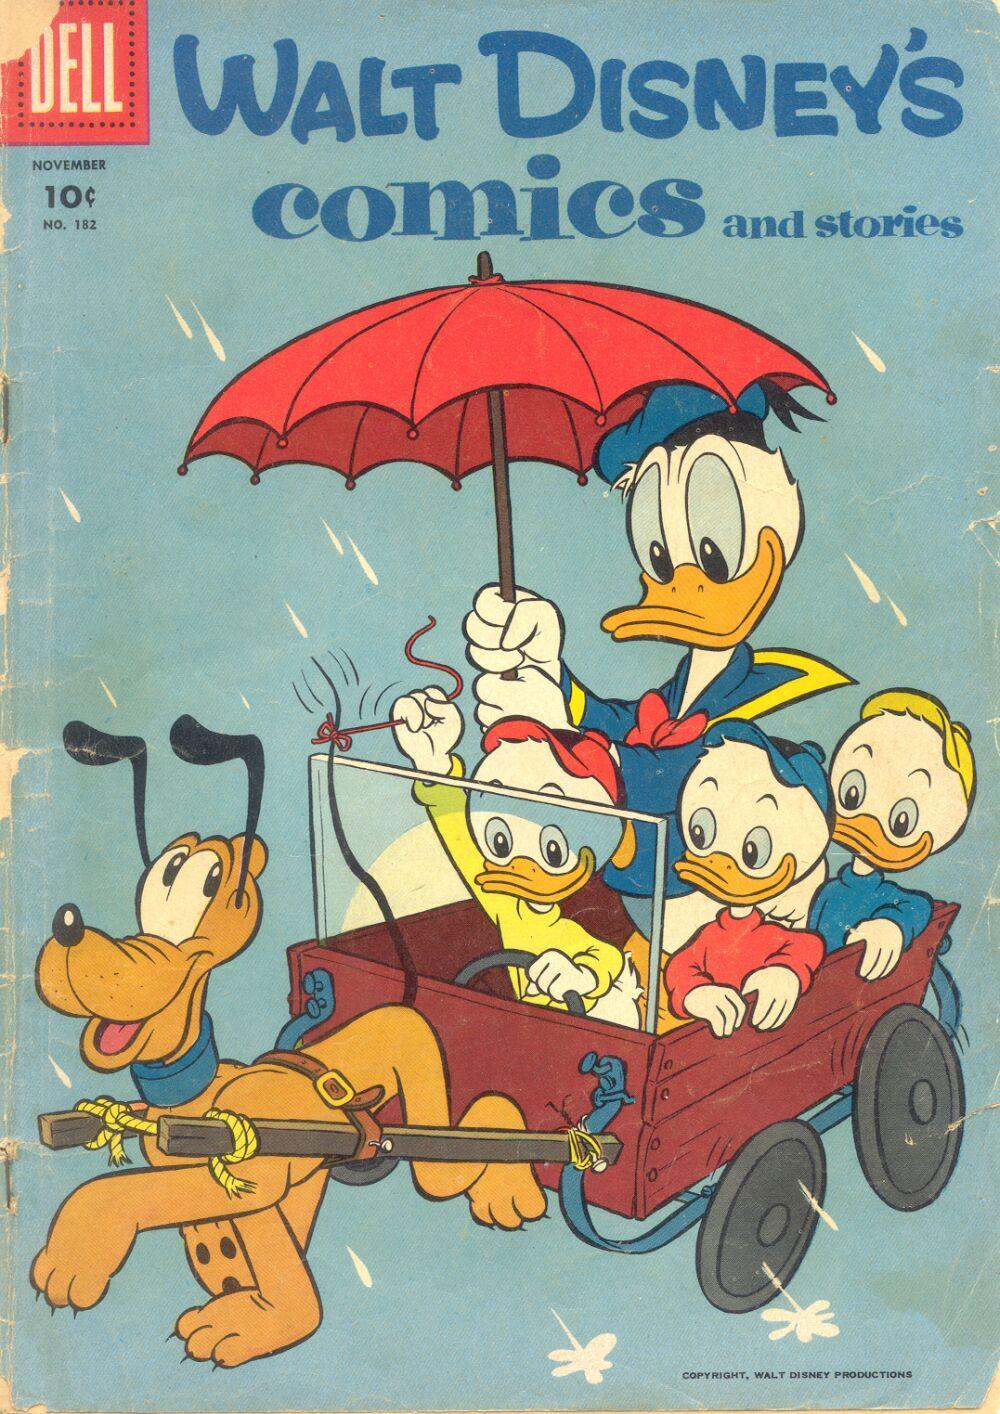 Walt Disneys Comics and Stories 182 Page 1